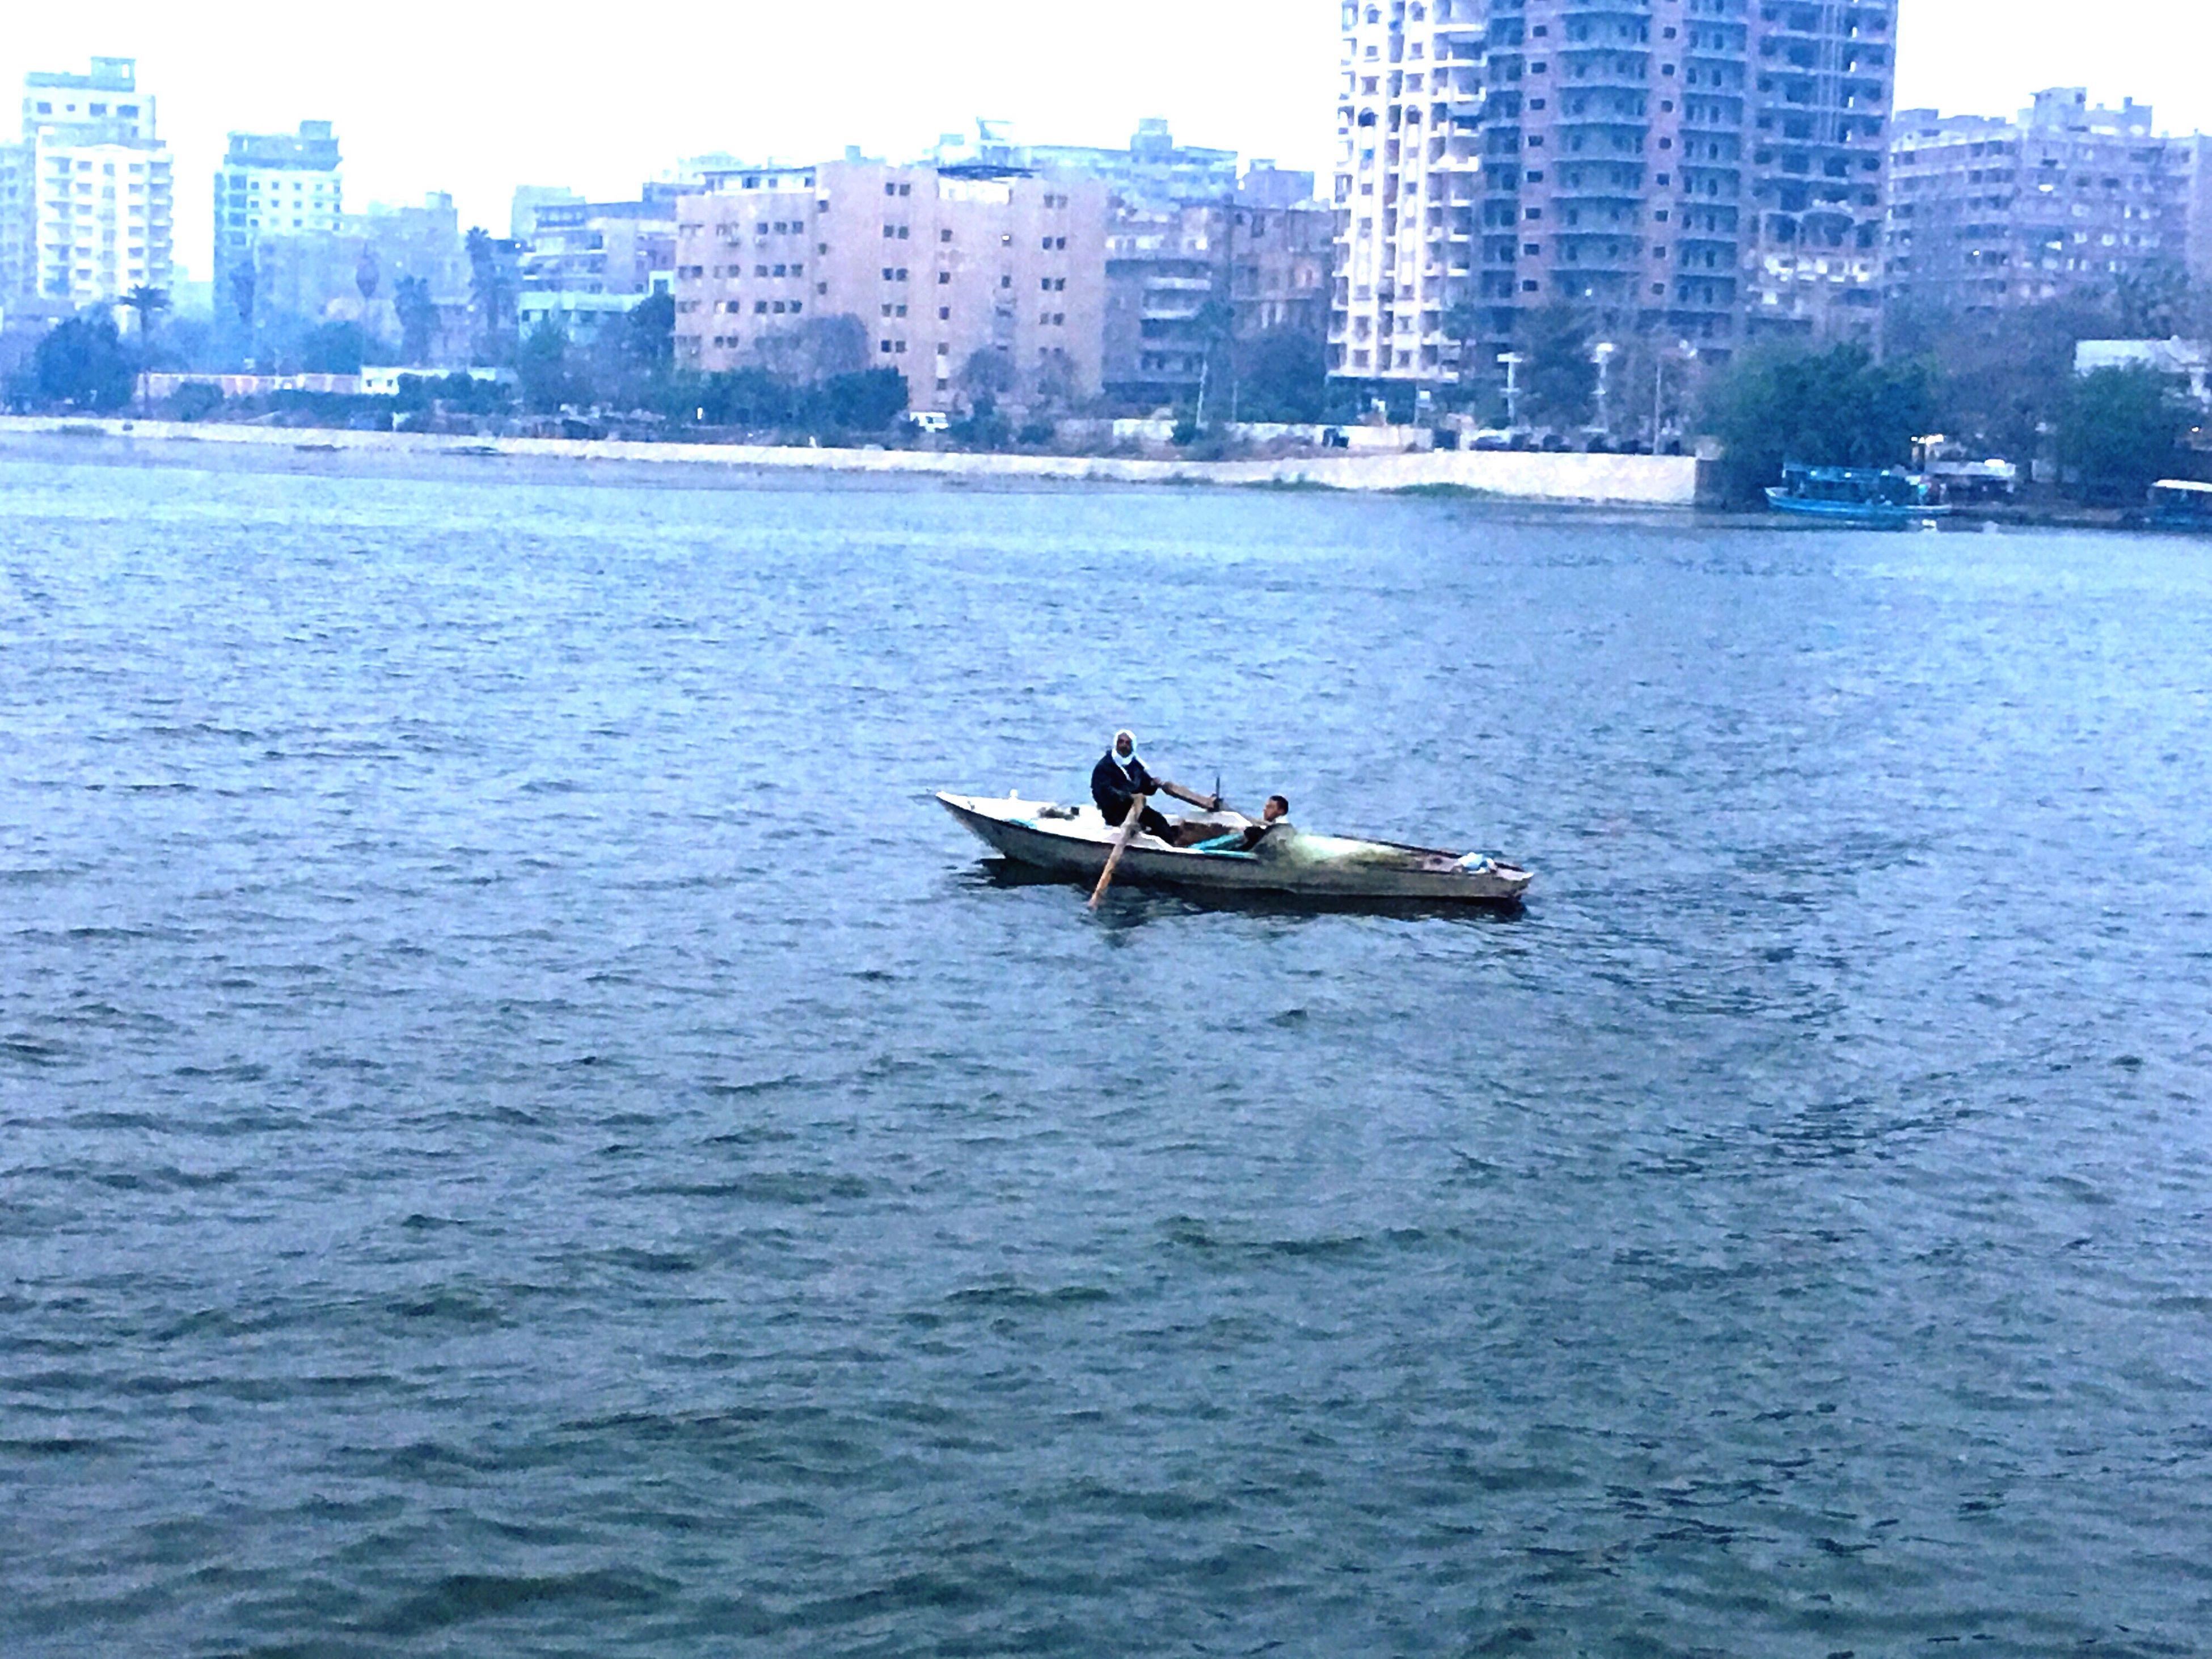 EyeEmNewHere Water Egyptian Nile